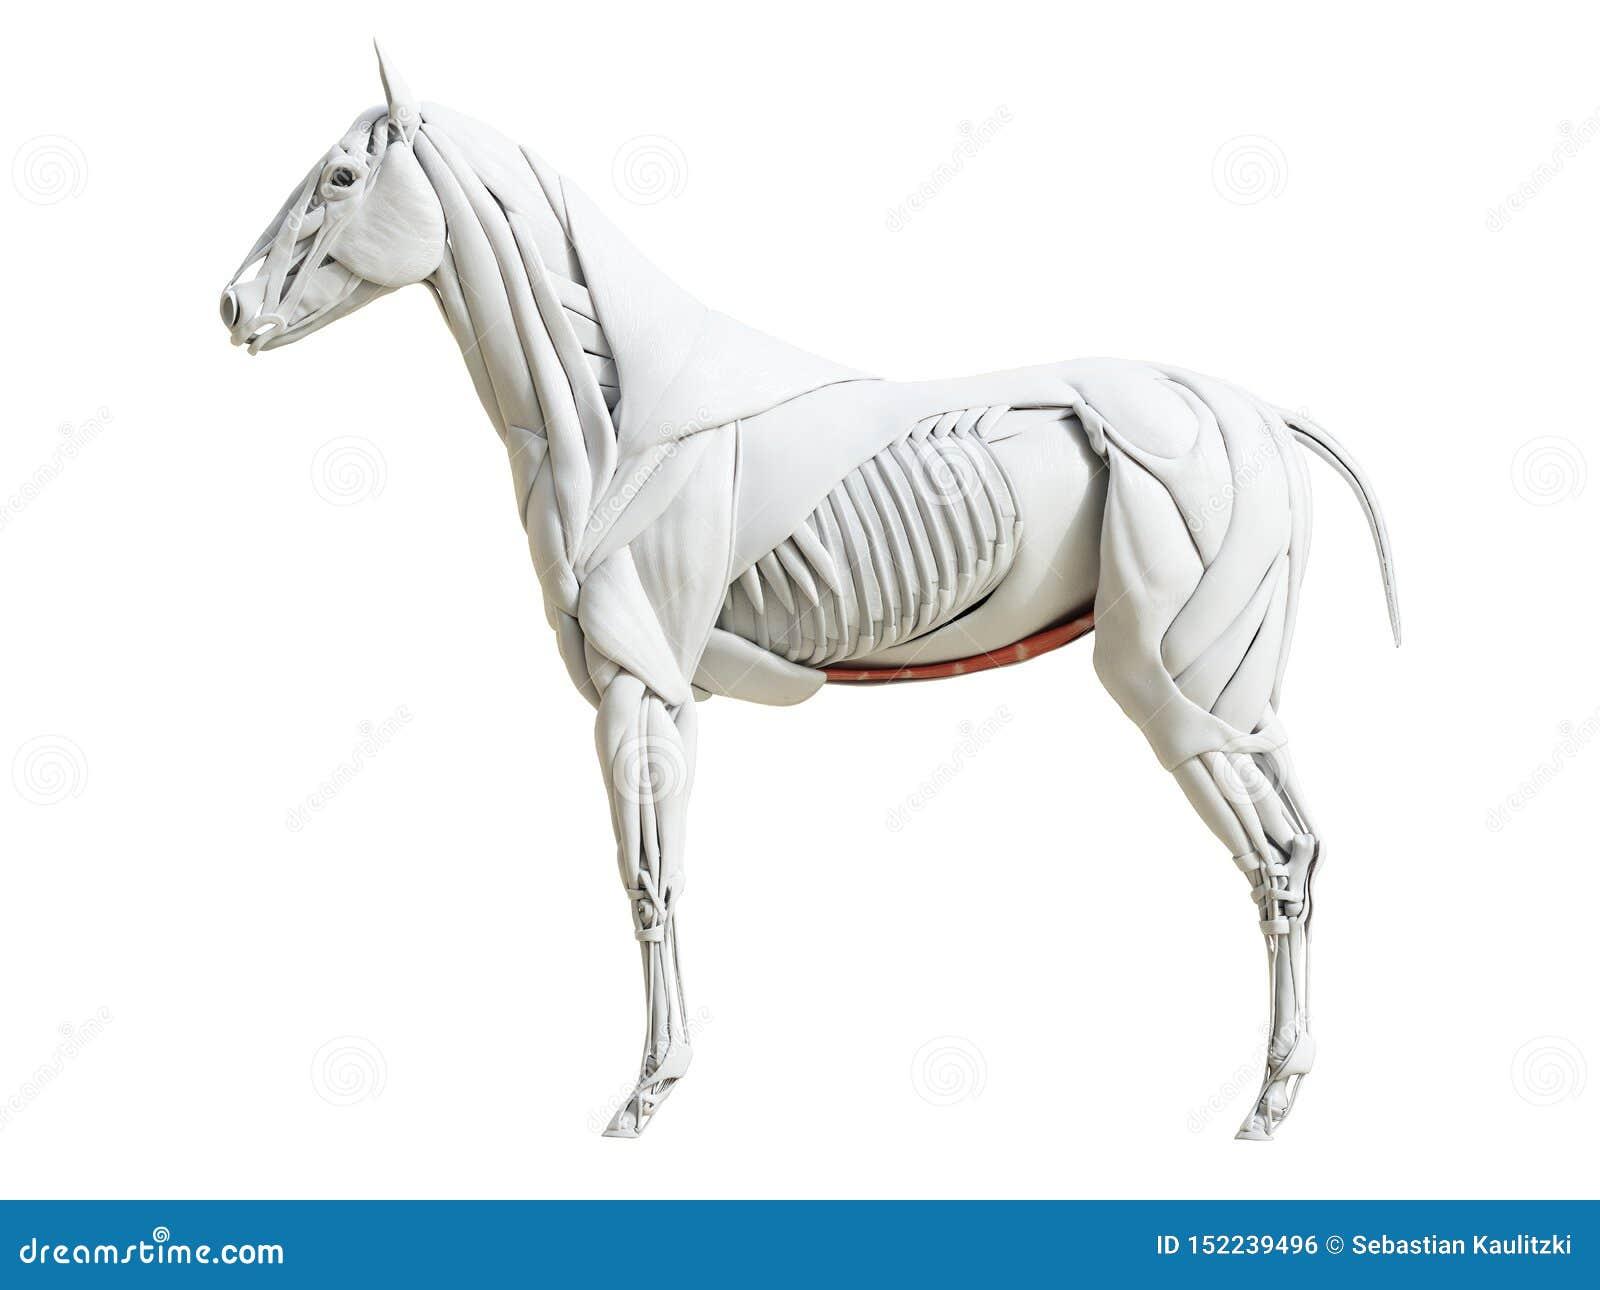 Equine анатомия мышцы - abdominis rectus